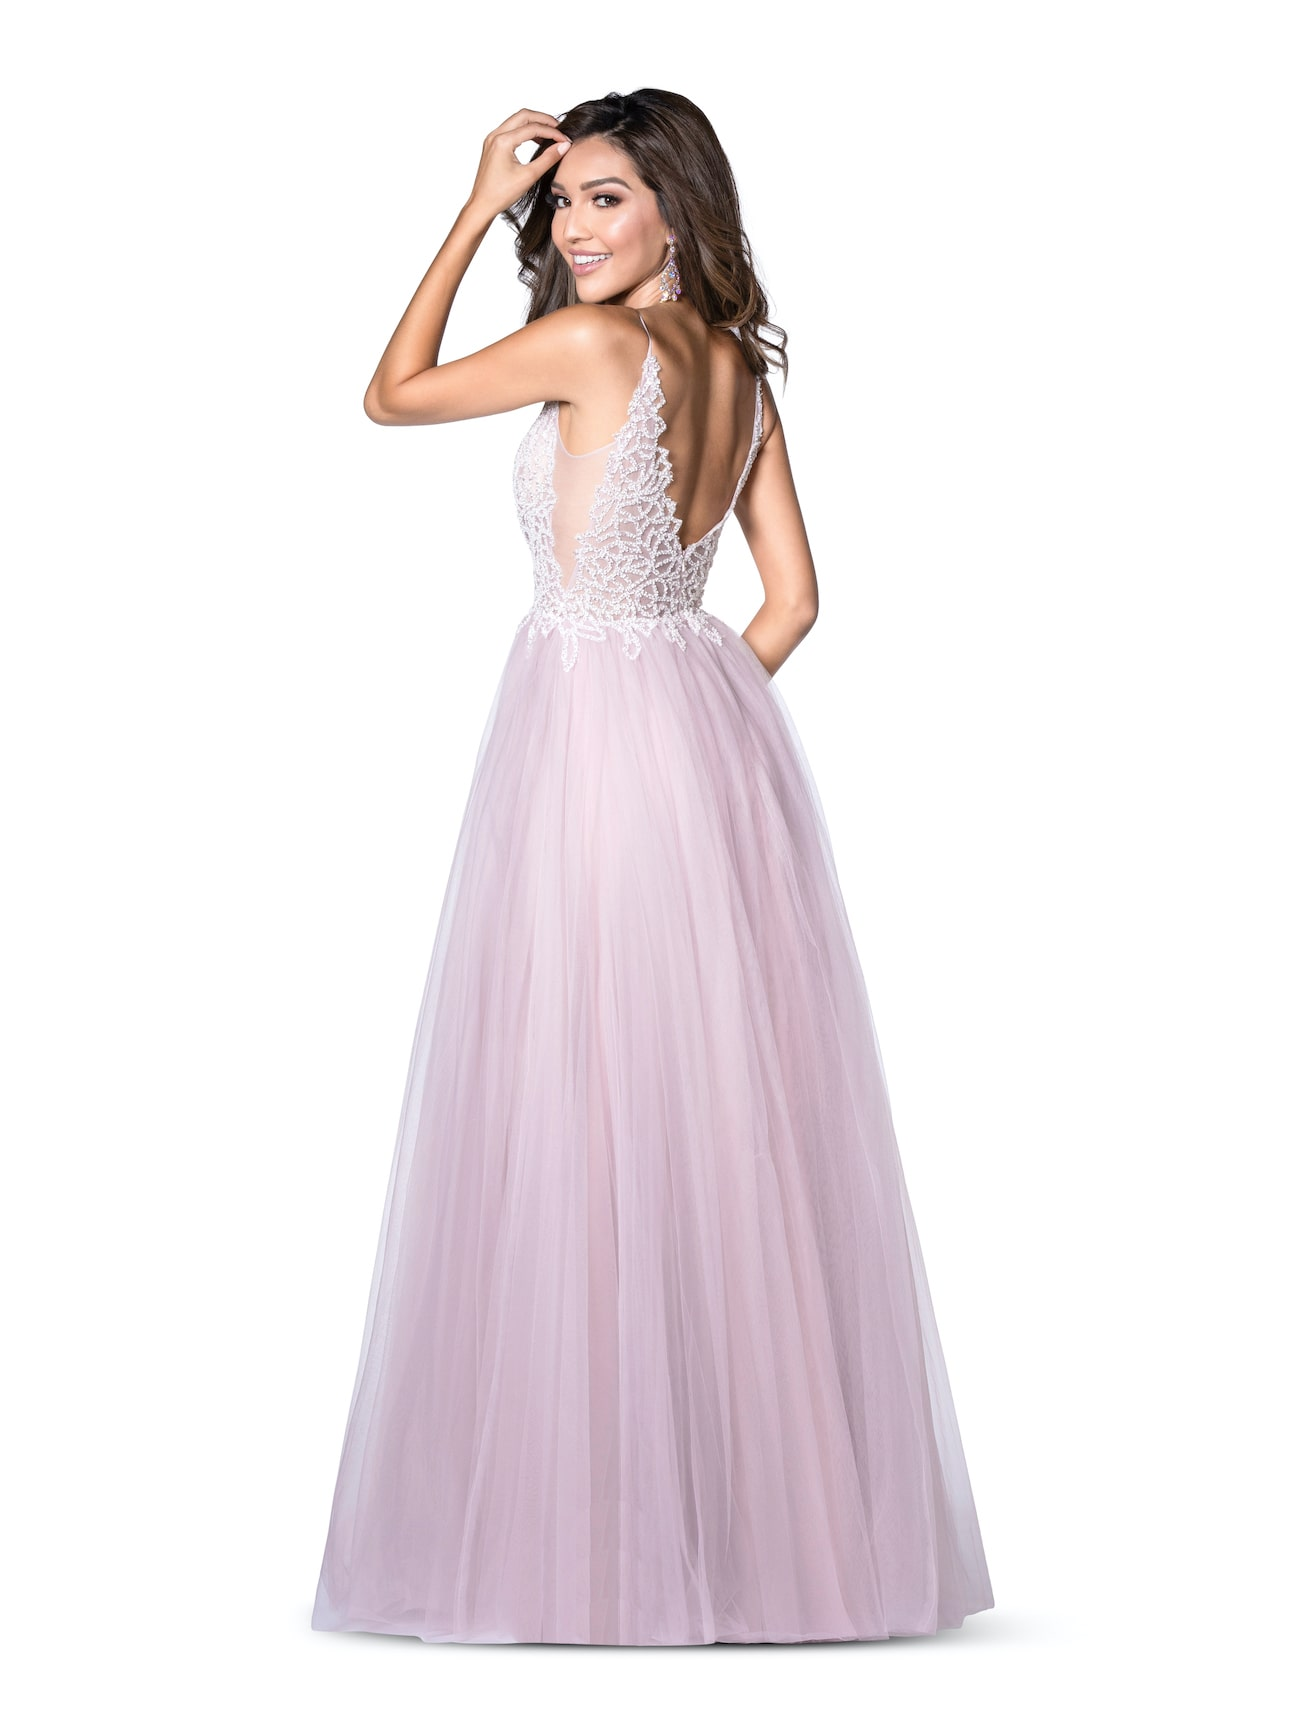 Vienna Light Blue Size 14 A-line Backless Side slit Dress on Queenly